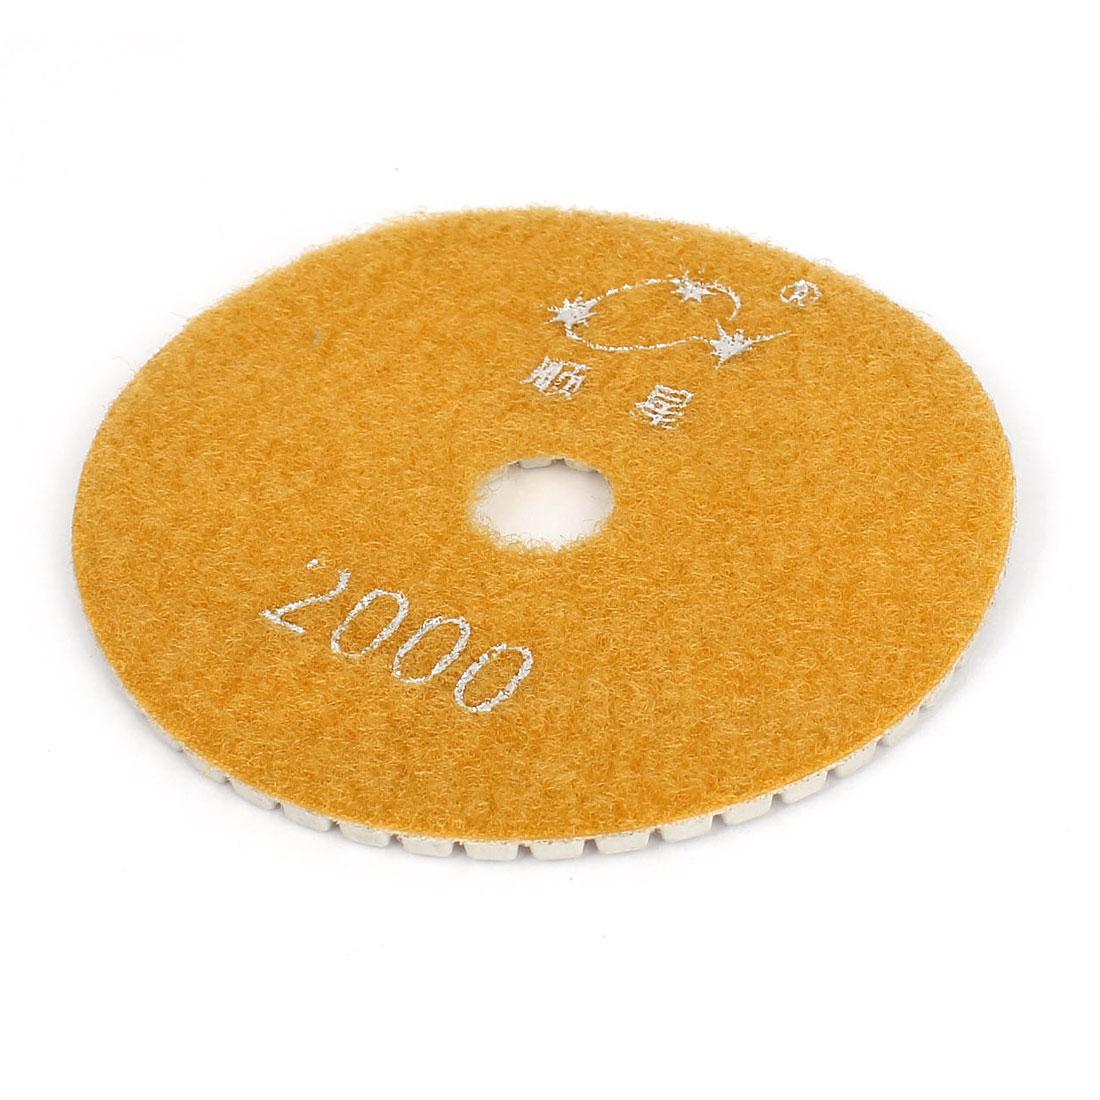 100mmx16mmx4mm Diamond Polishing Wet Pad 2000 Grit for Granite Concrete Stone